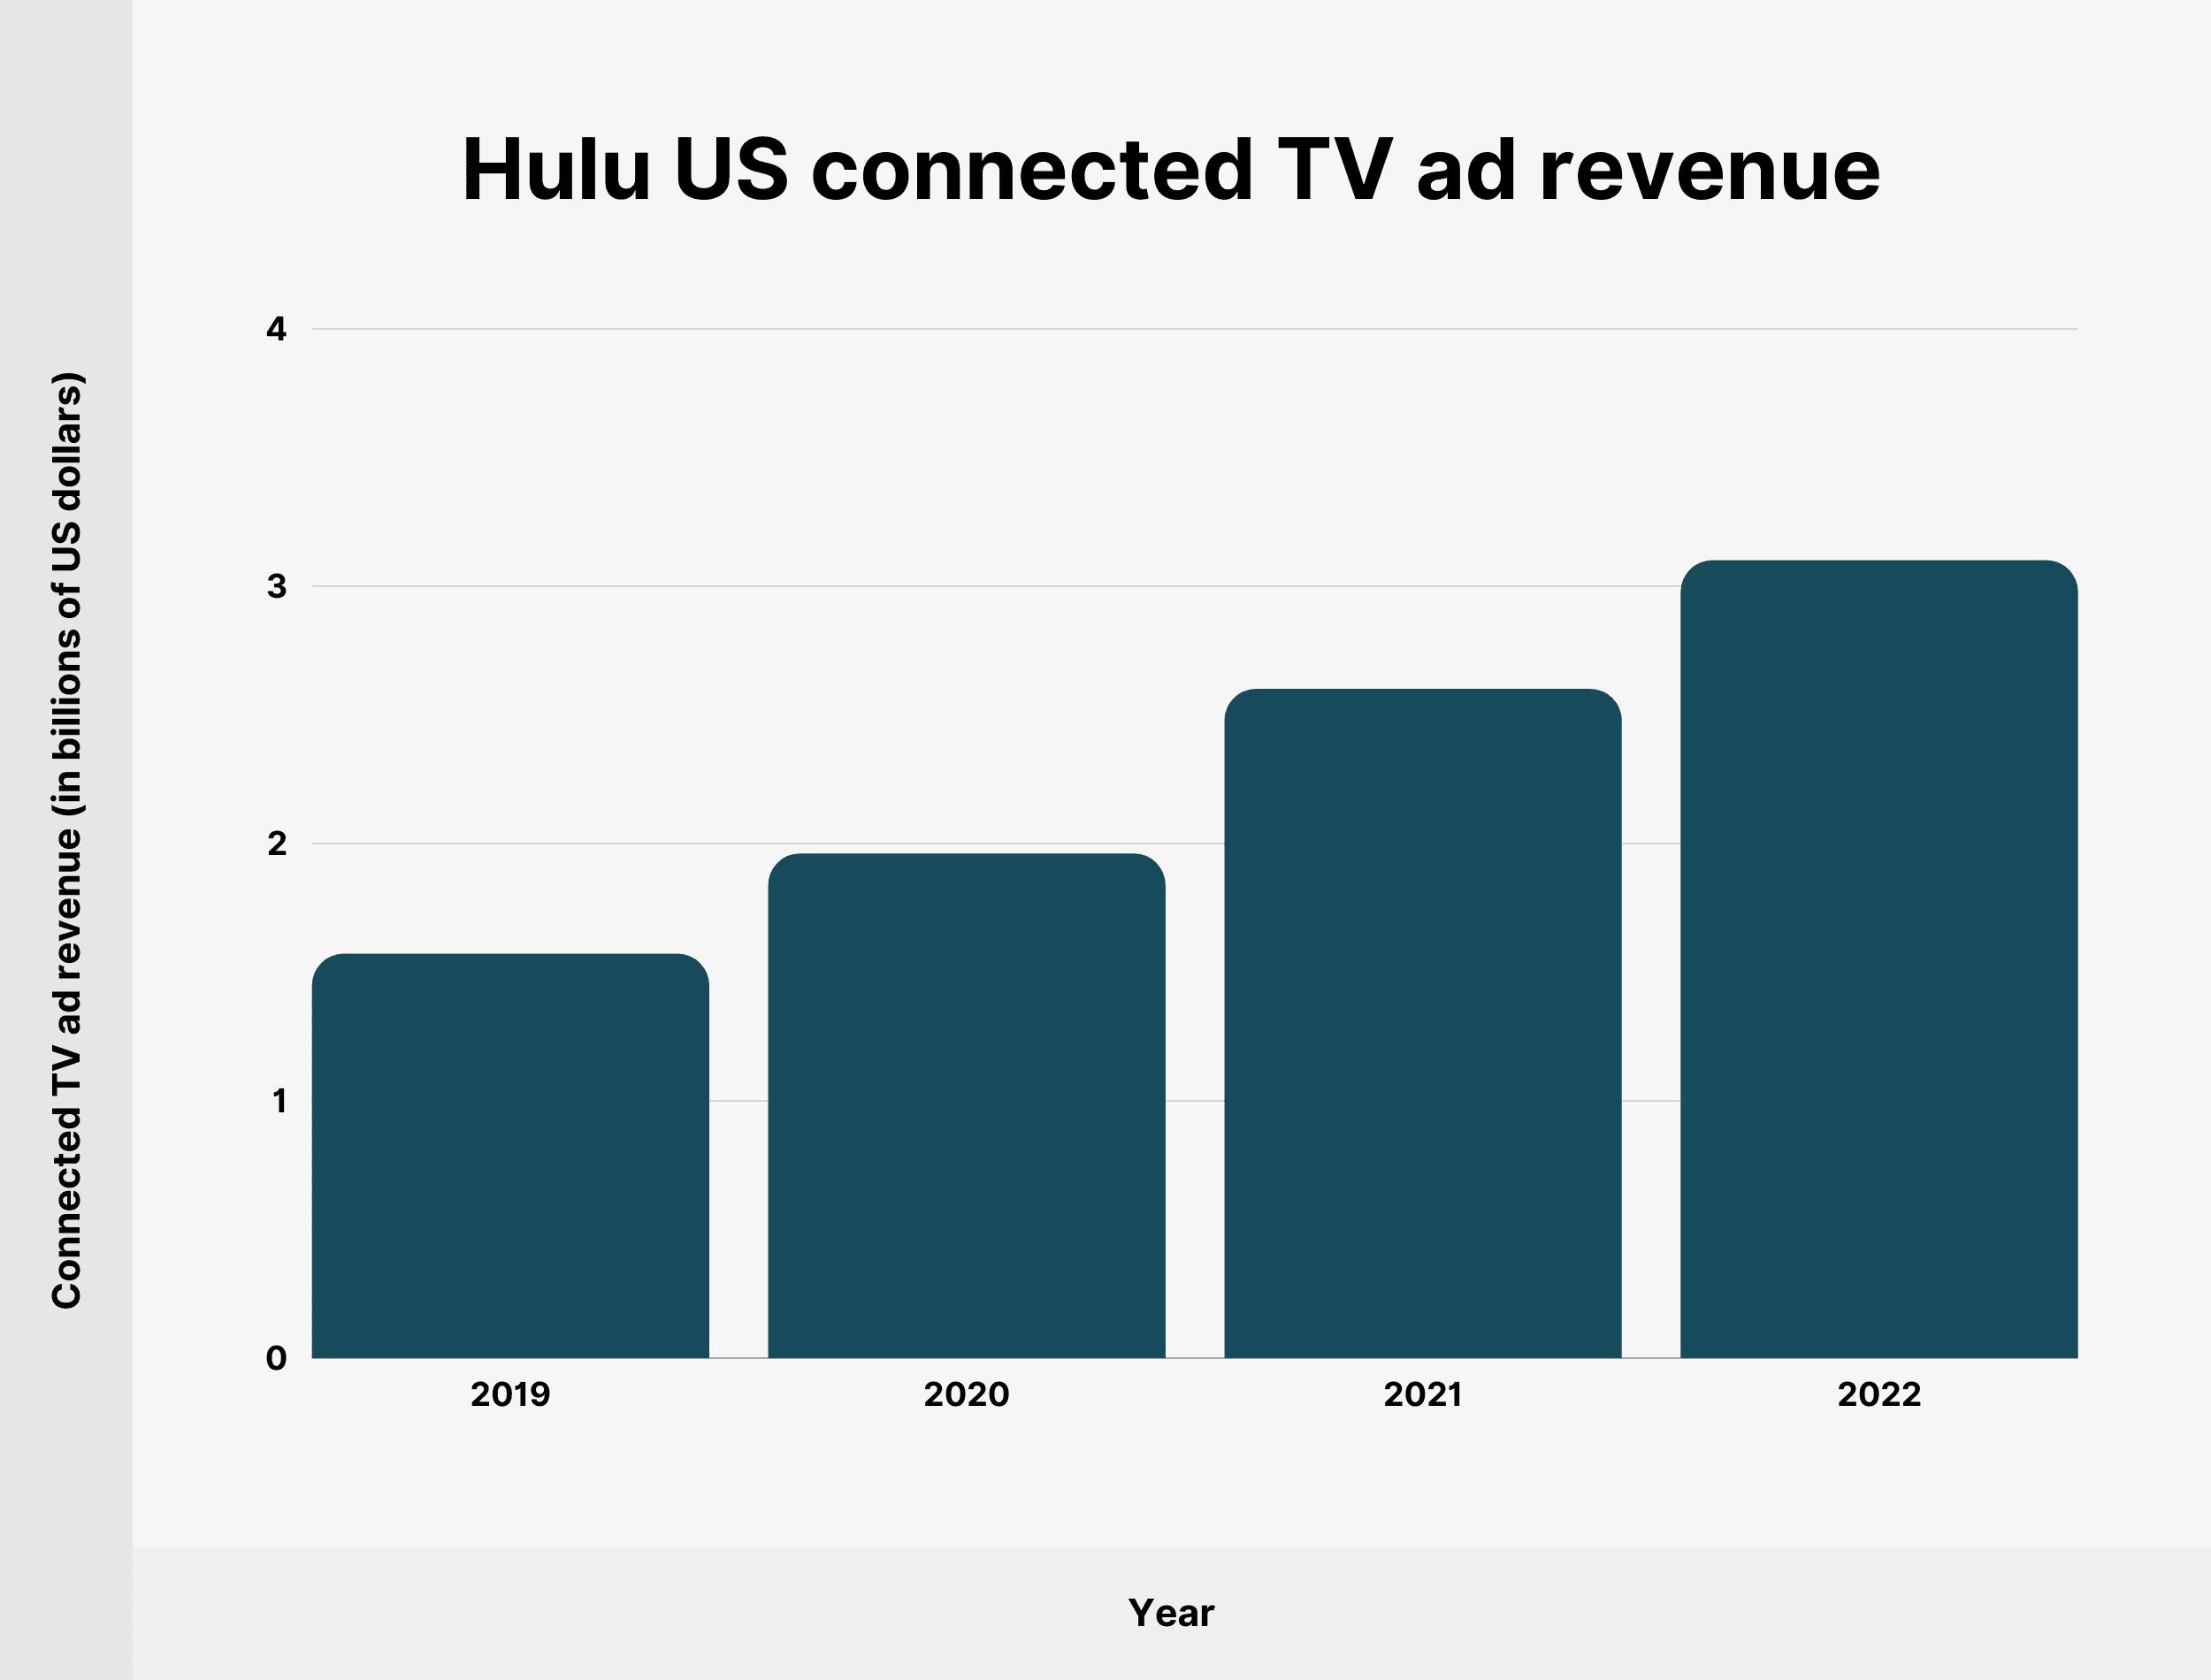 Hulu US connected TV ad revenue